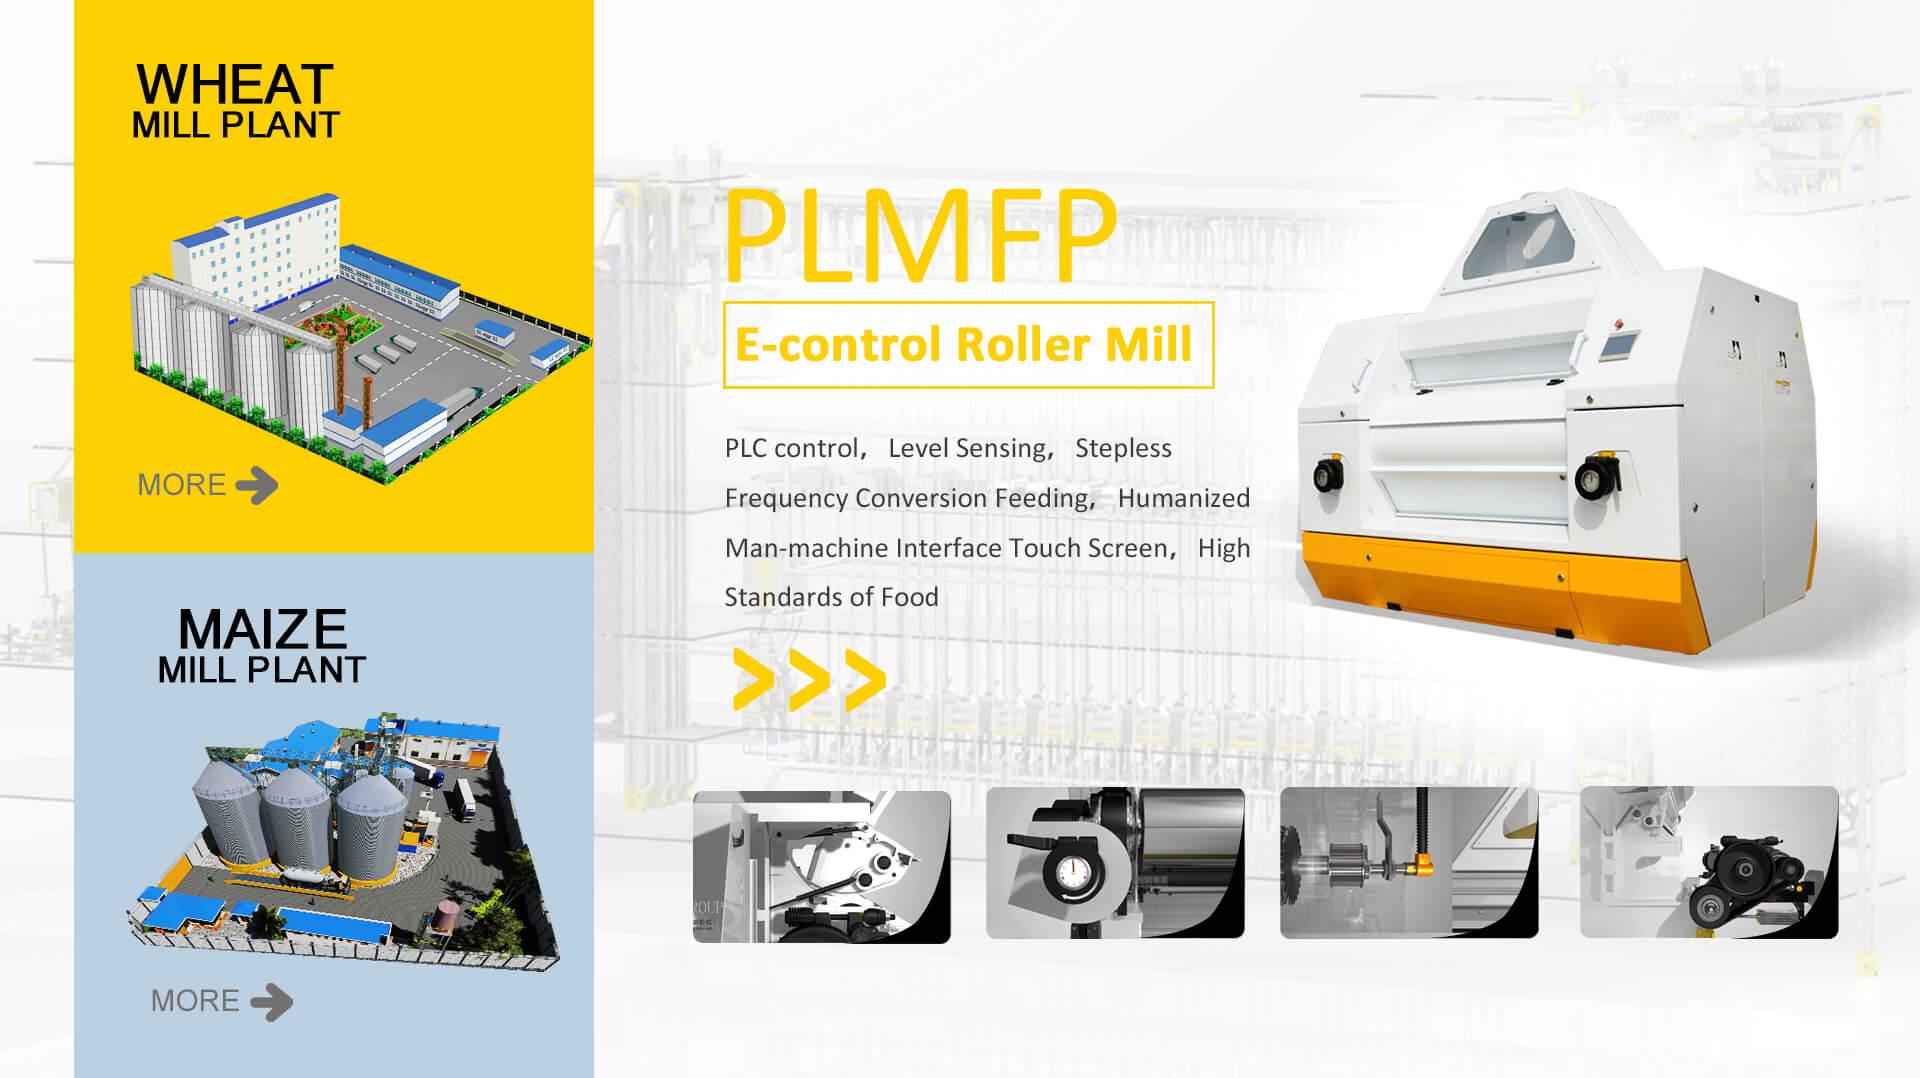 PLMFP کنترل الکترونیکی غلتک آسیاب